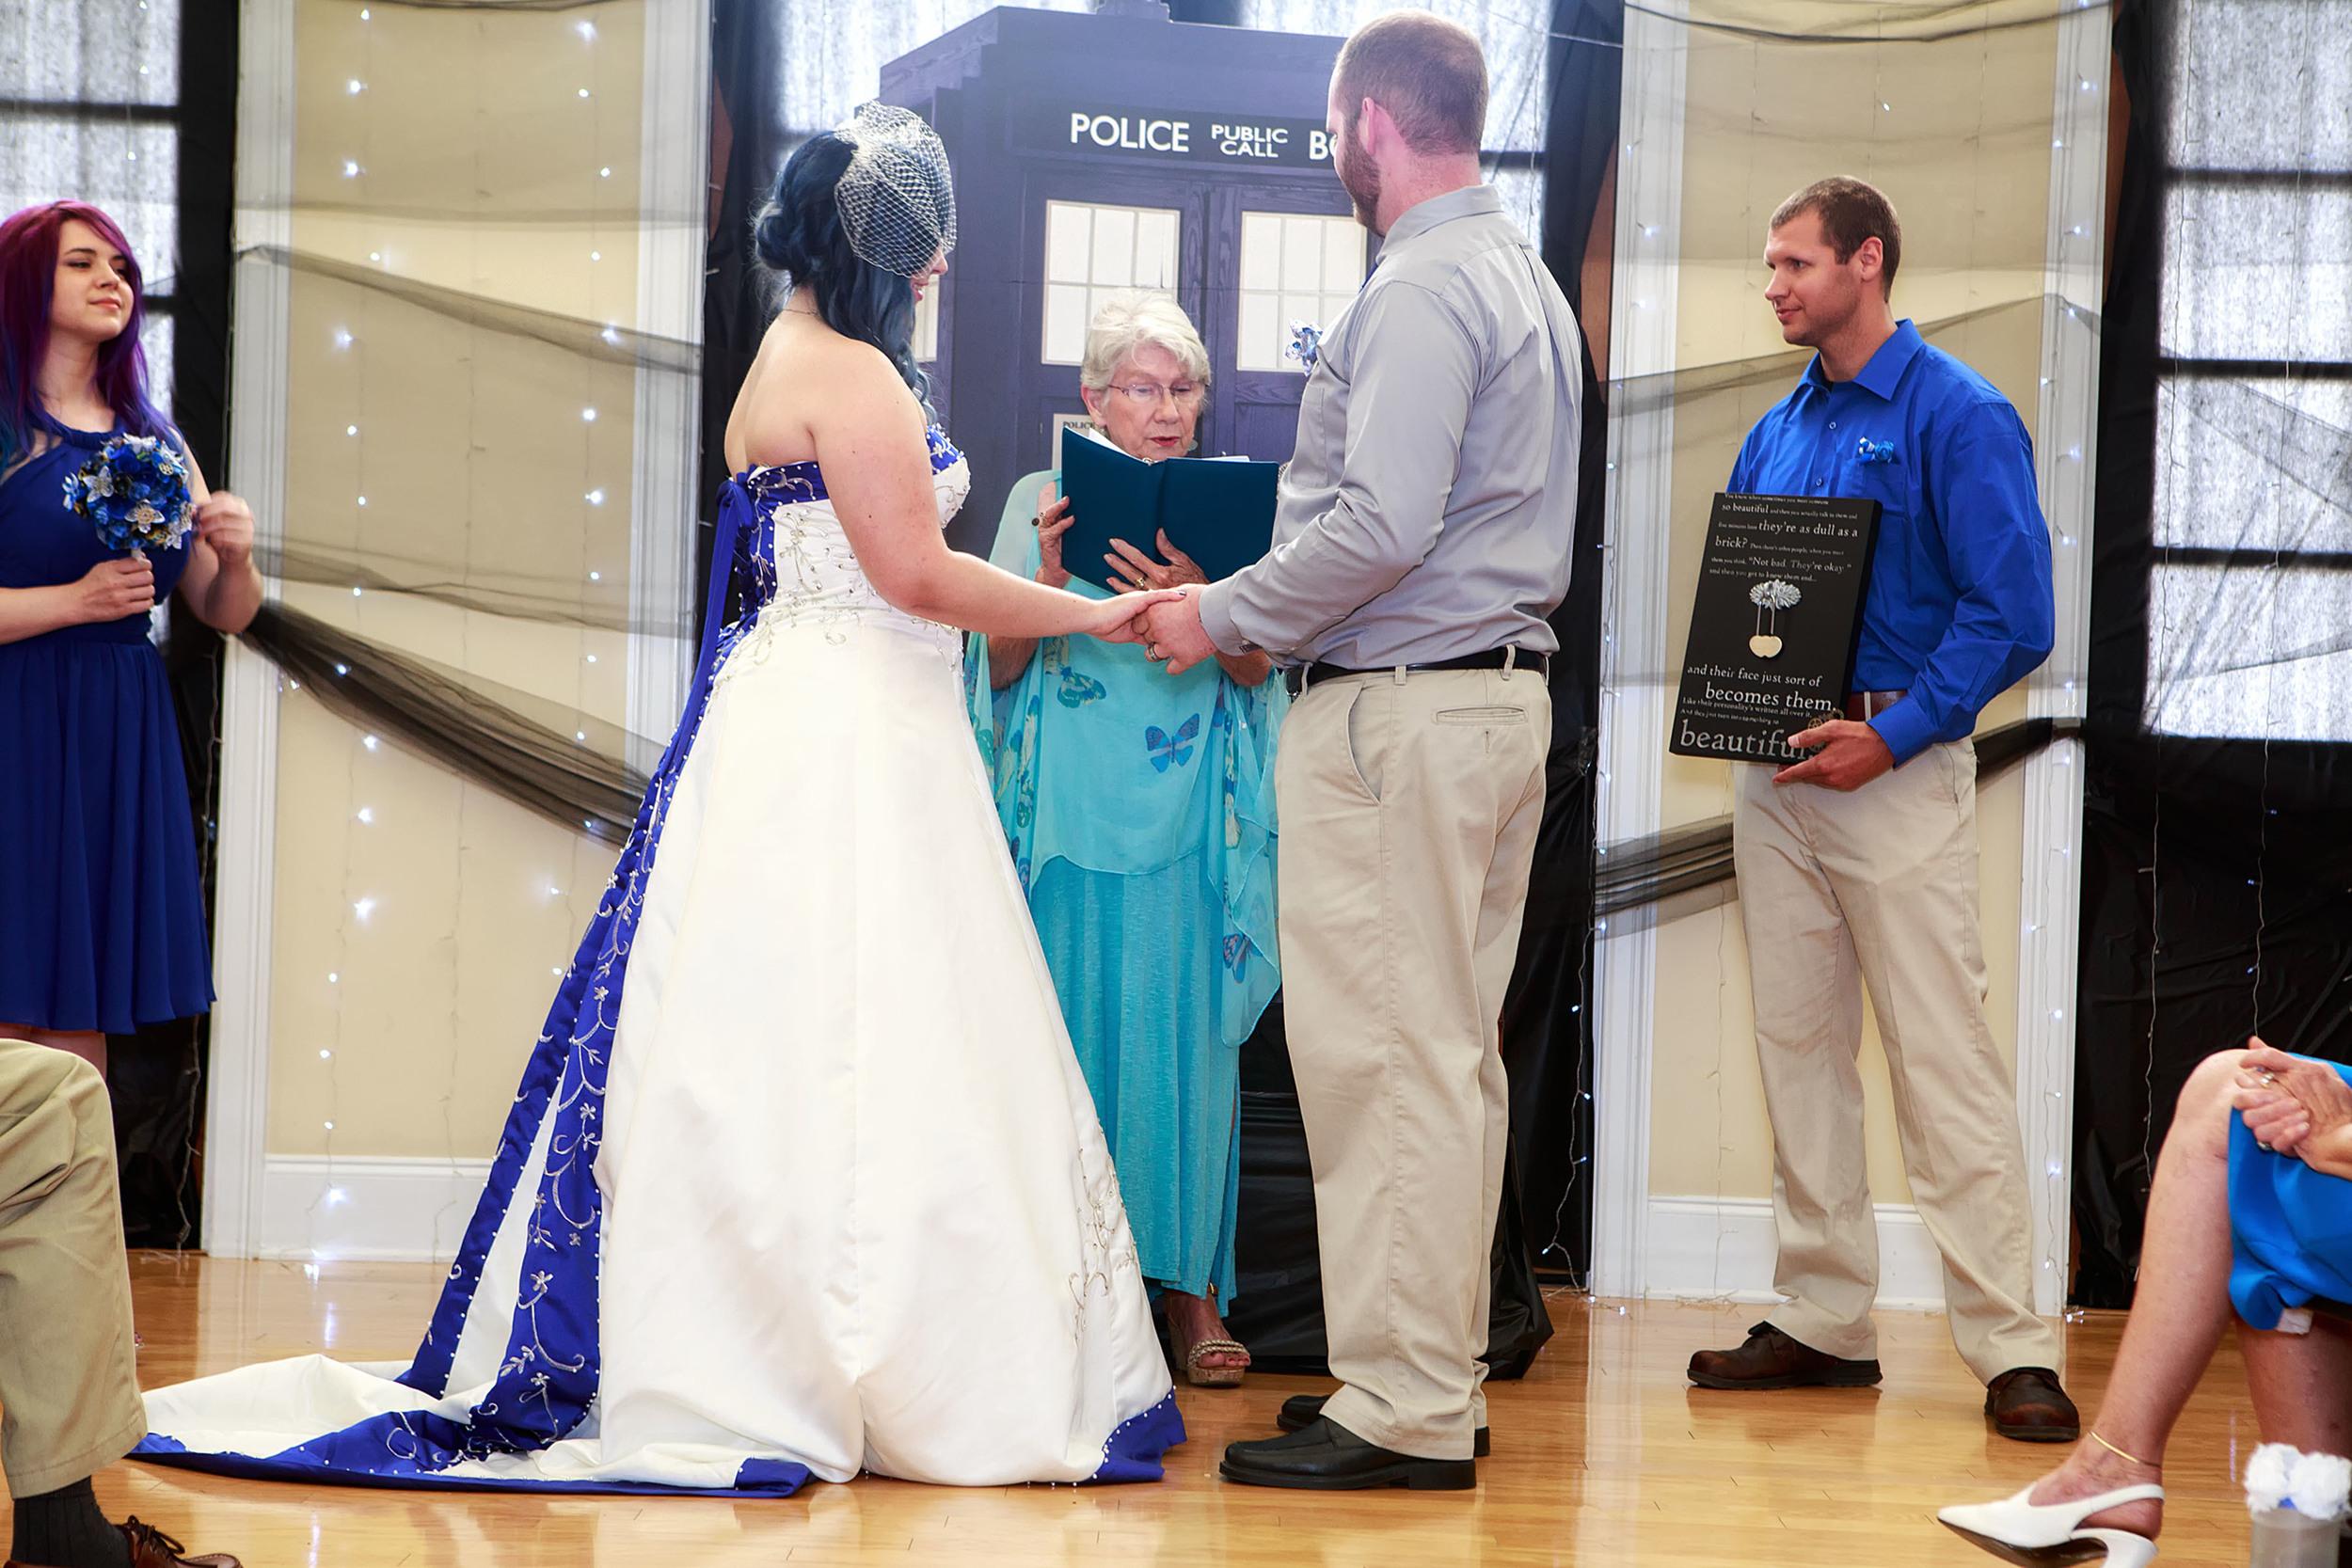 NC_Wedding_Photographer_Tiffany_Abruzzo_Ceremony_41.jpg